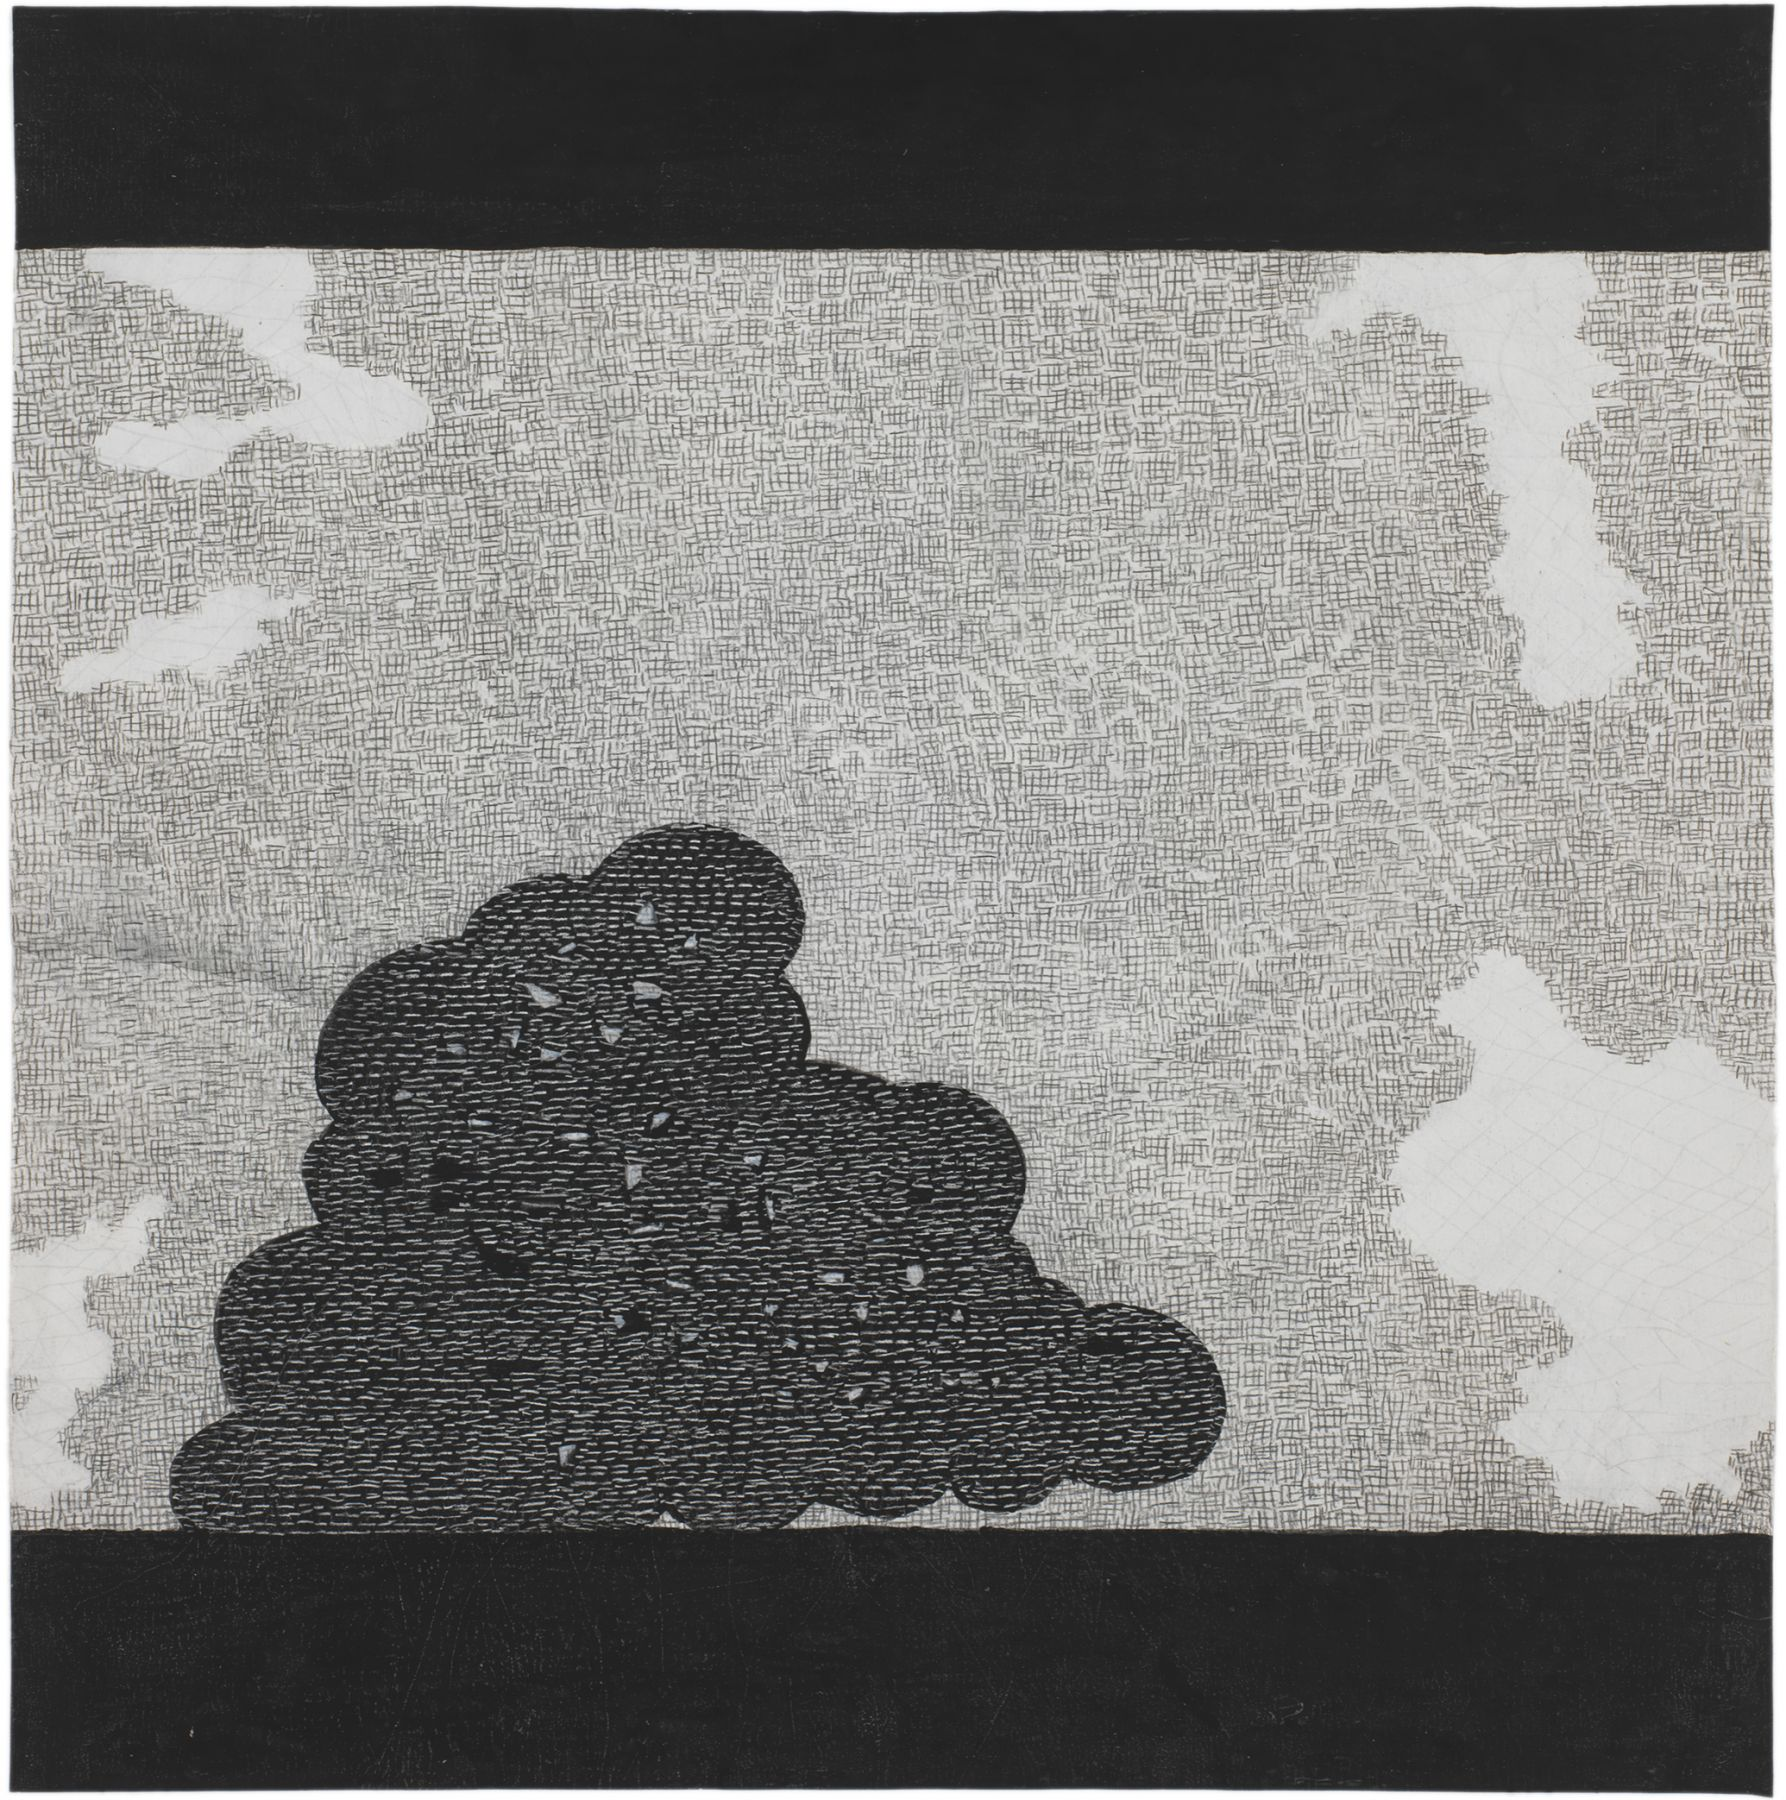 Theresa Chong, T'UNG JEN (Companionship), 2014